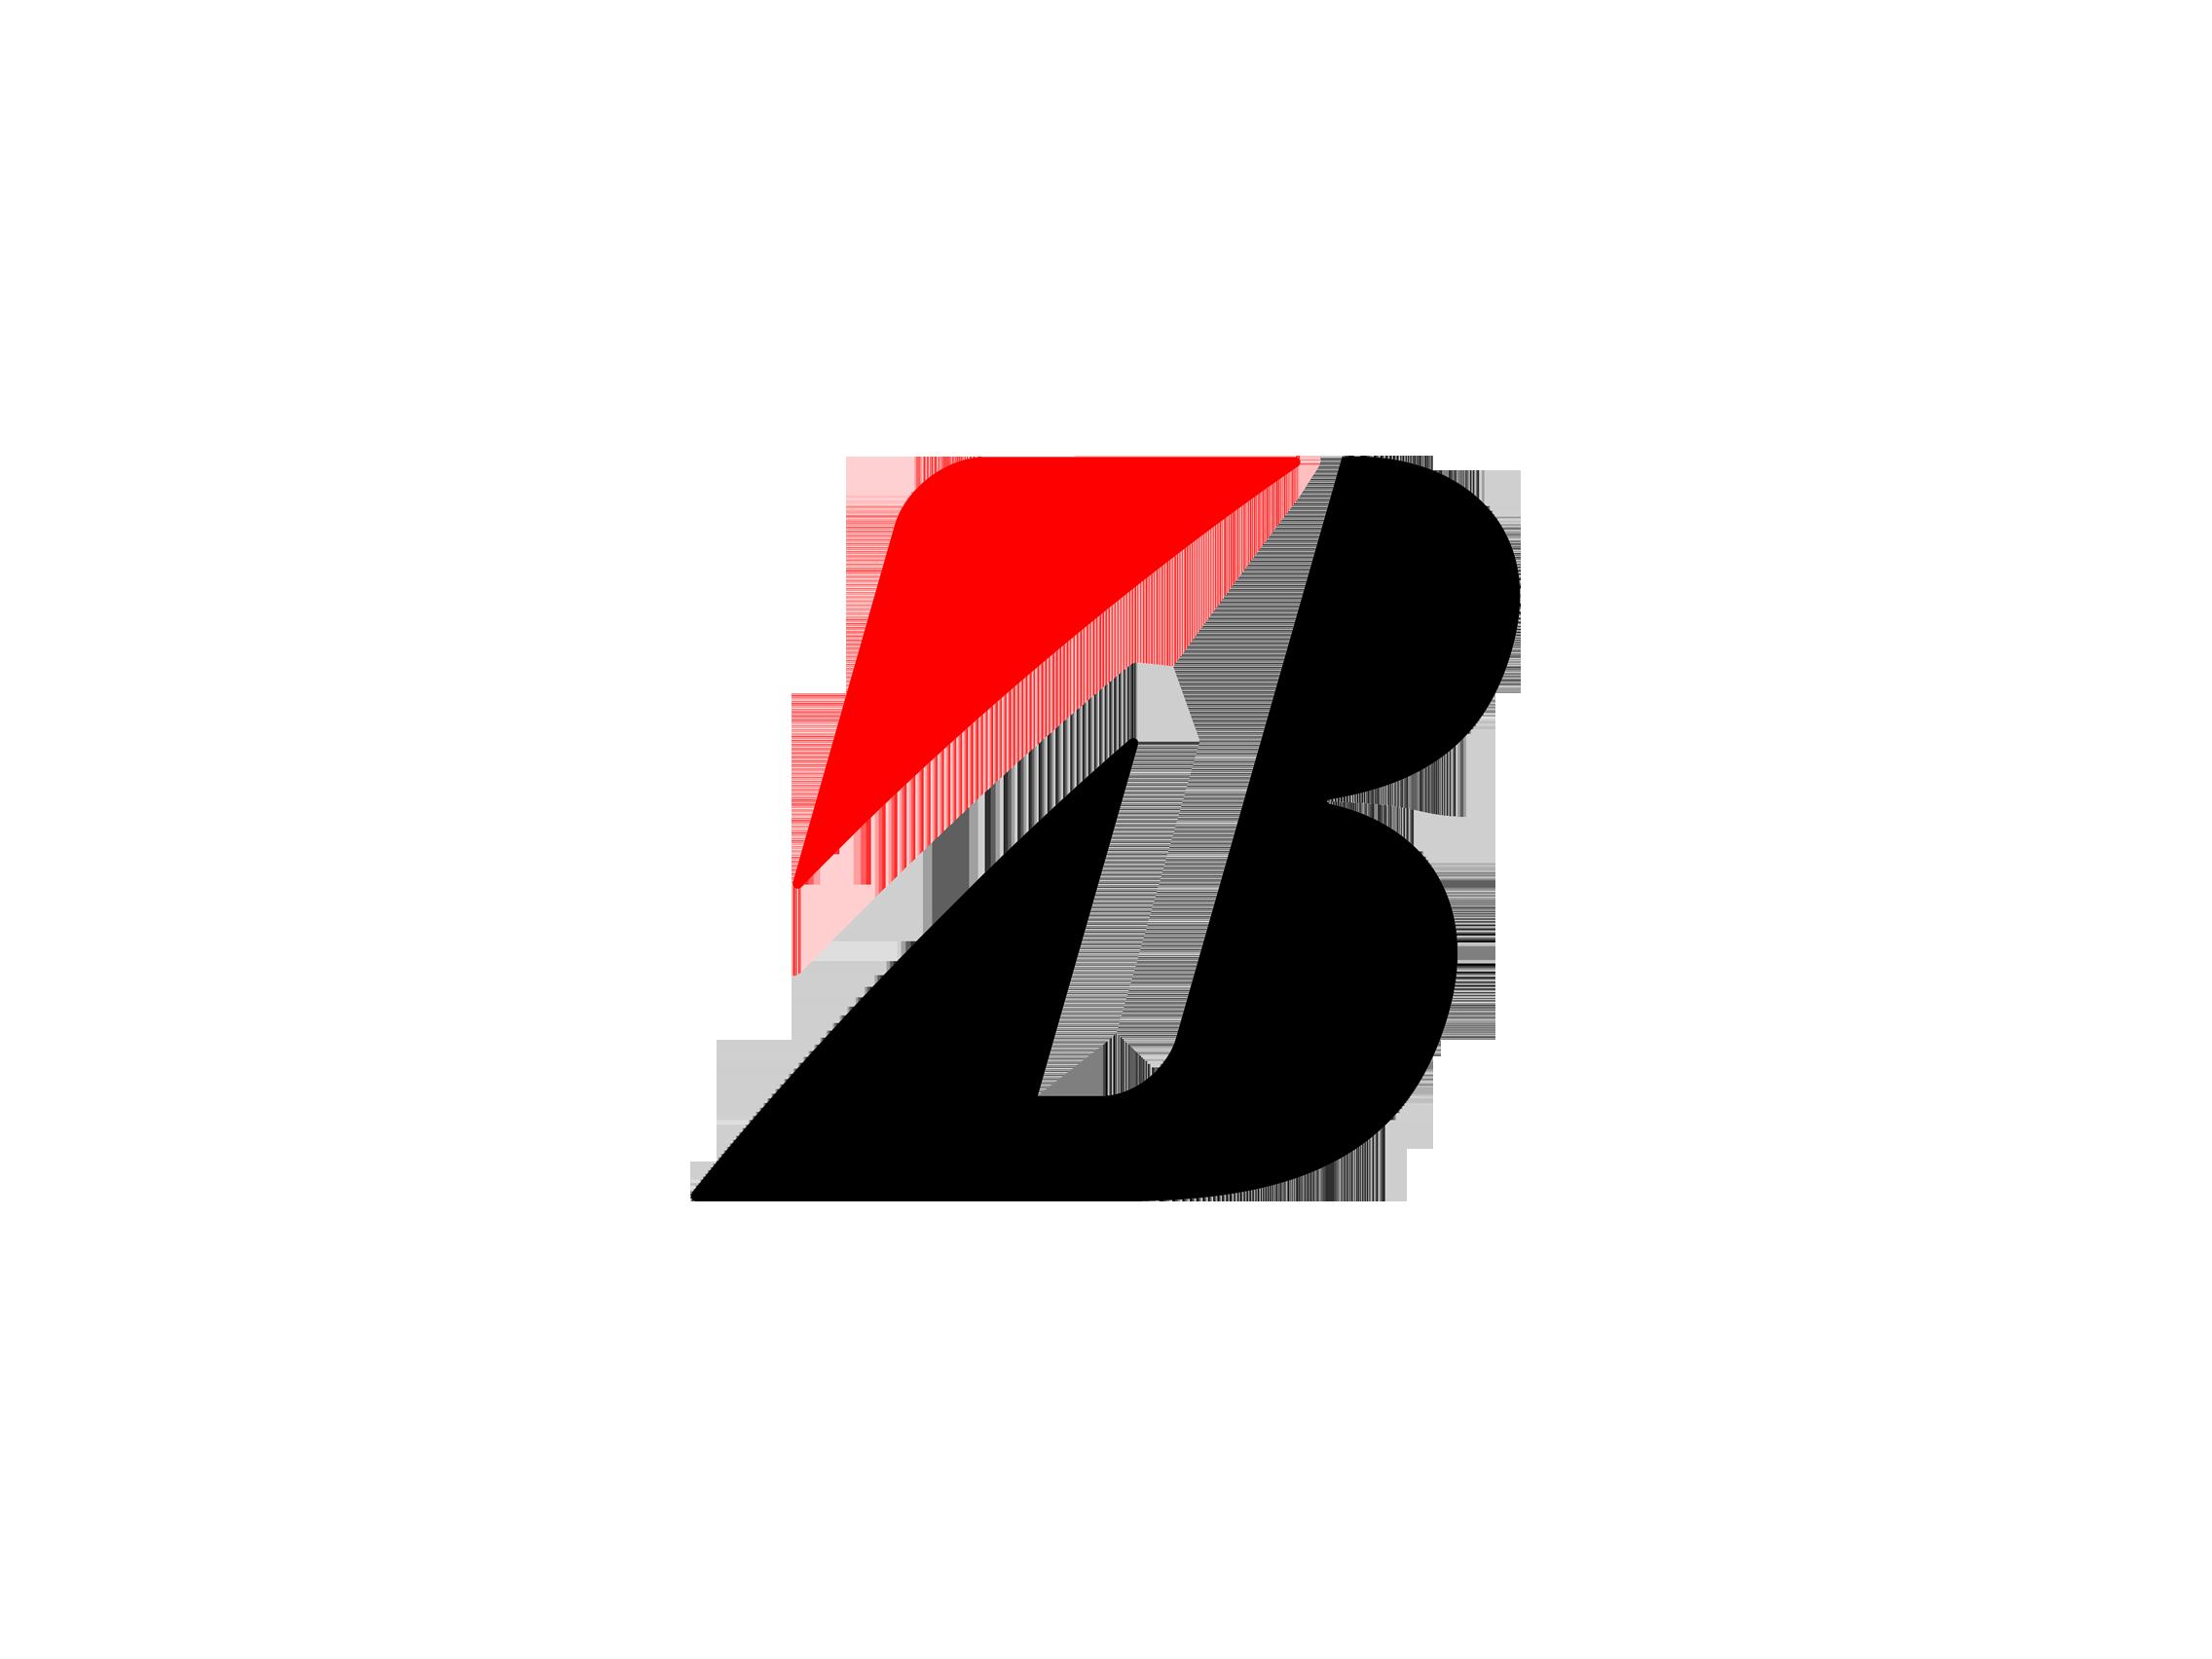 b logo logos design logos letter logo